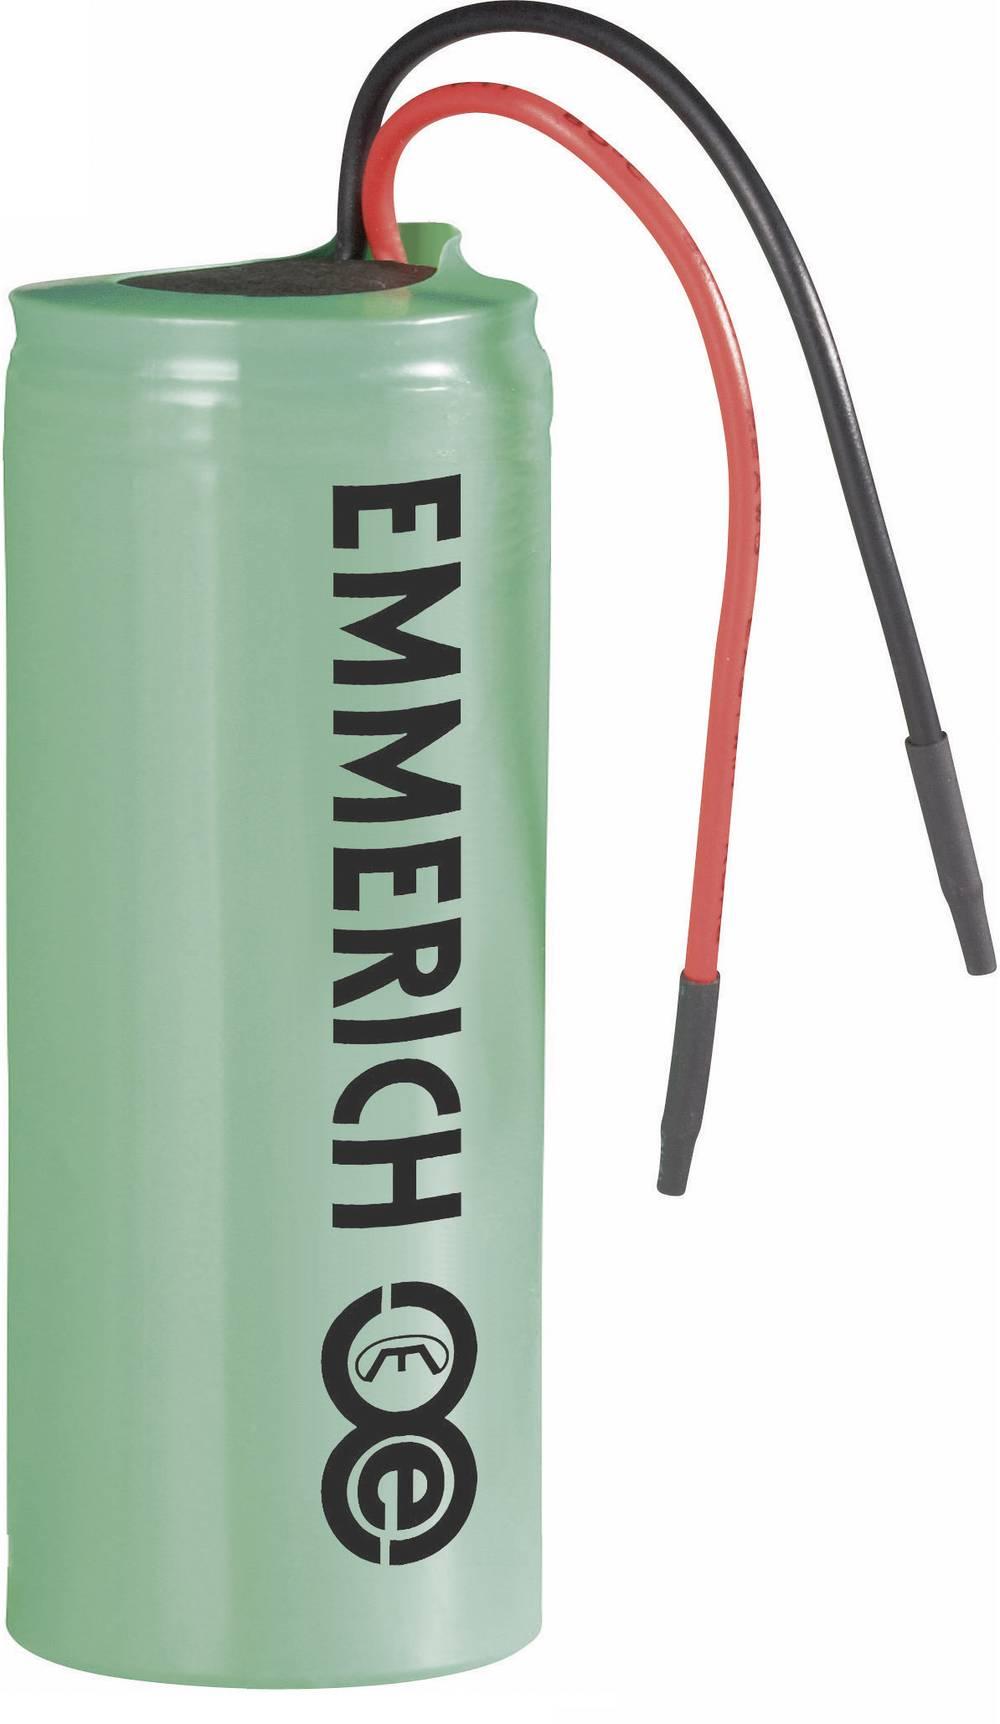 Litij-ionski akumulator s kablom 26650 Emmerich 3, 7 V, 4500 mAh